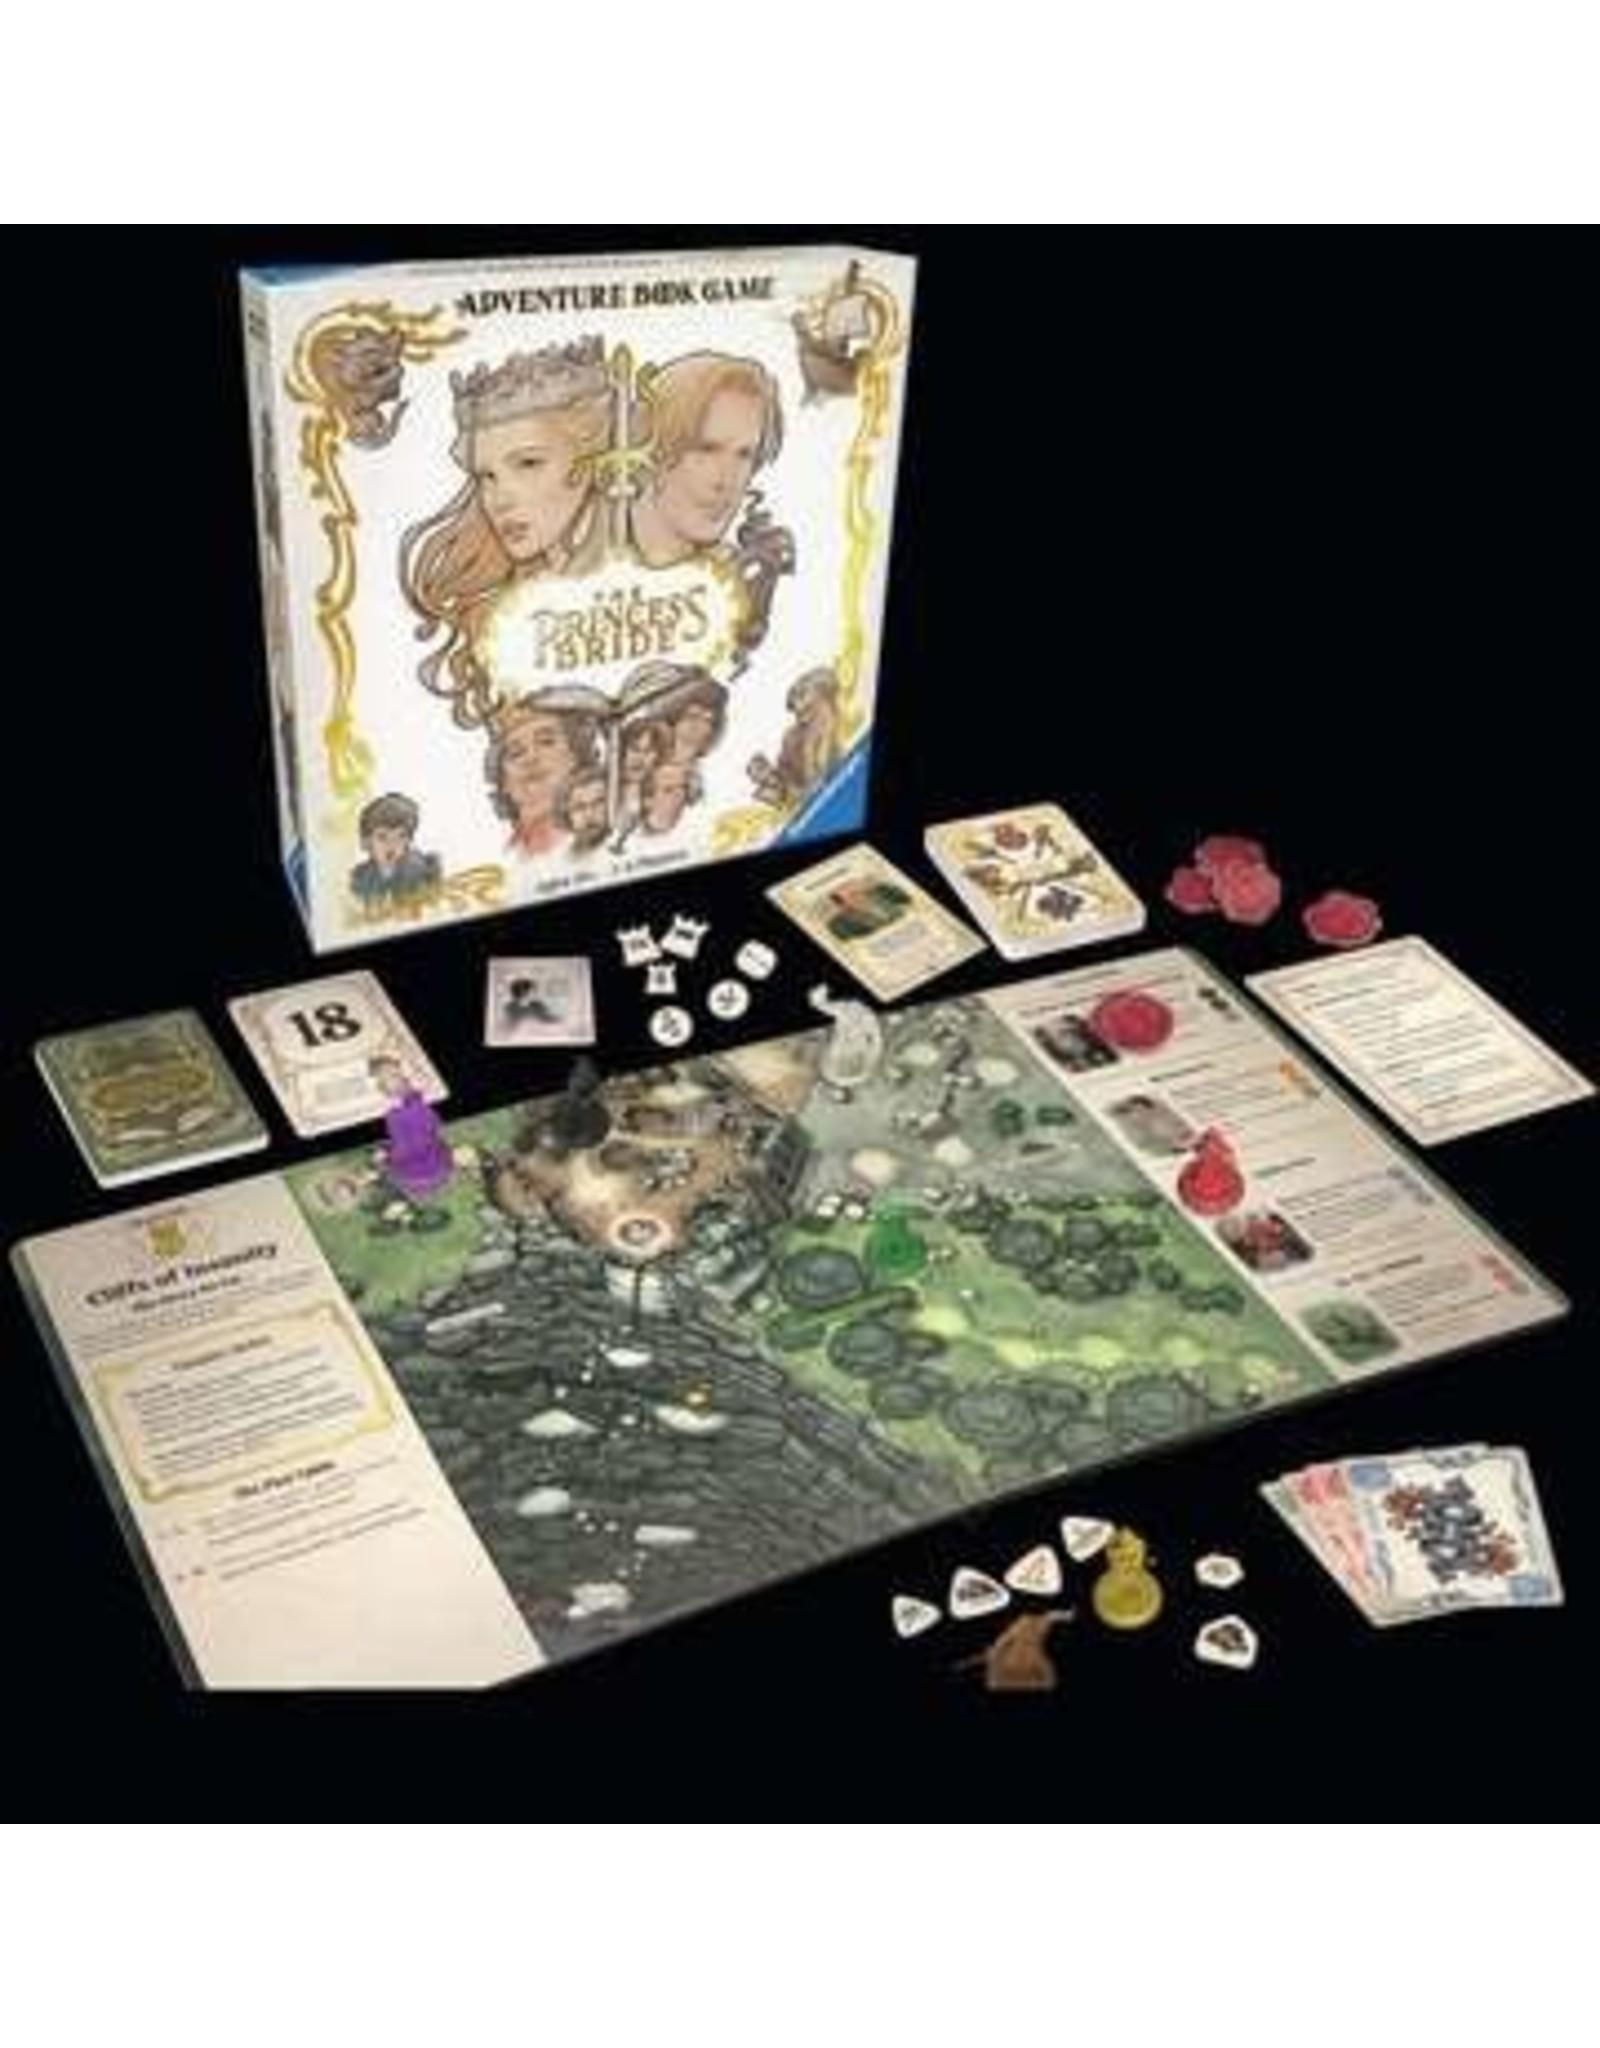 Ravensburger The Princess Bride Game